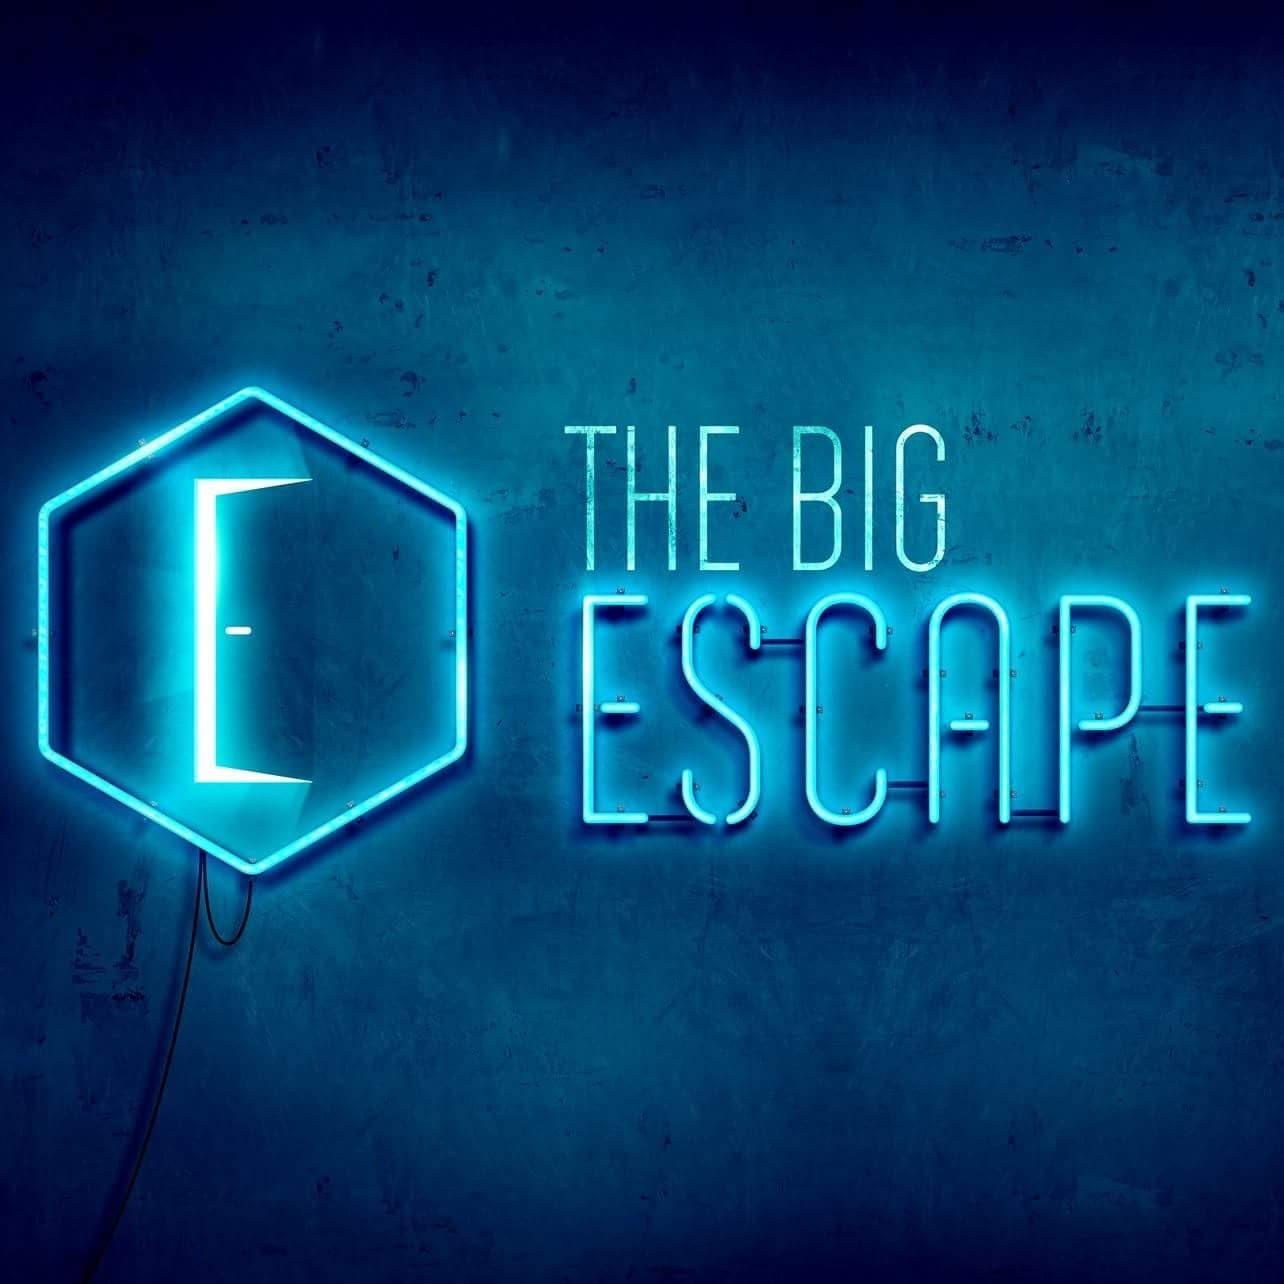 Logo The Big Escape